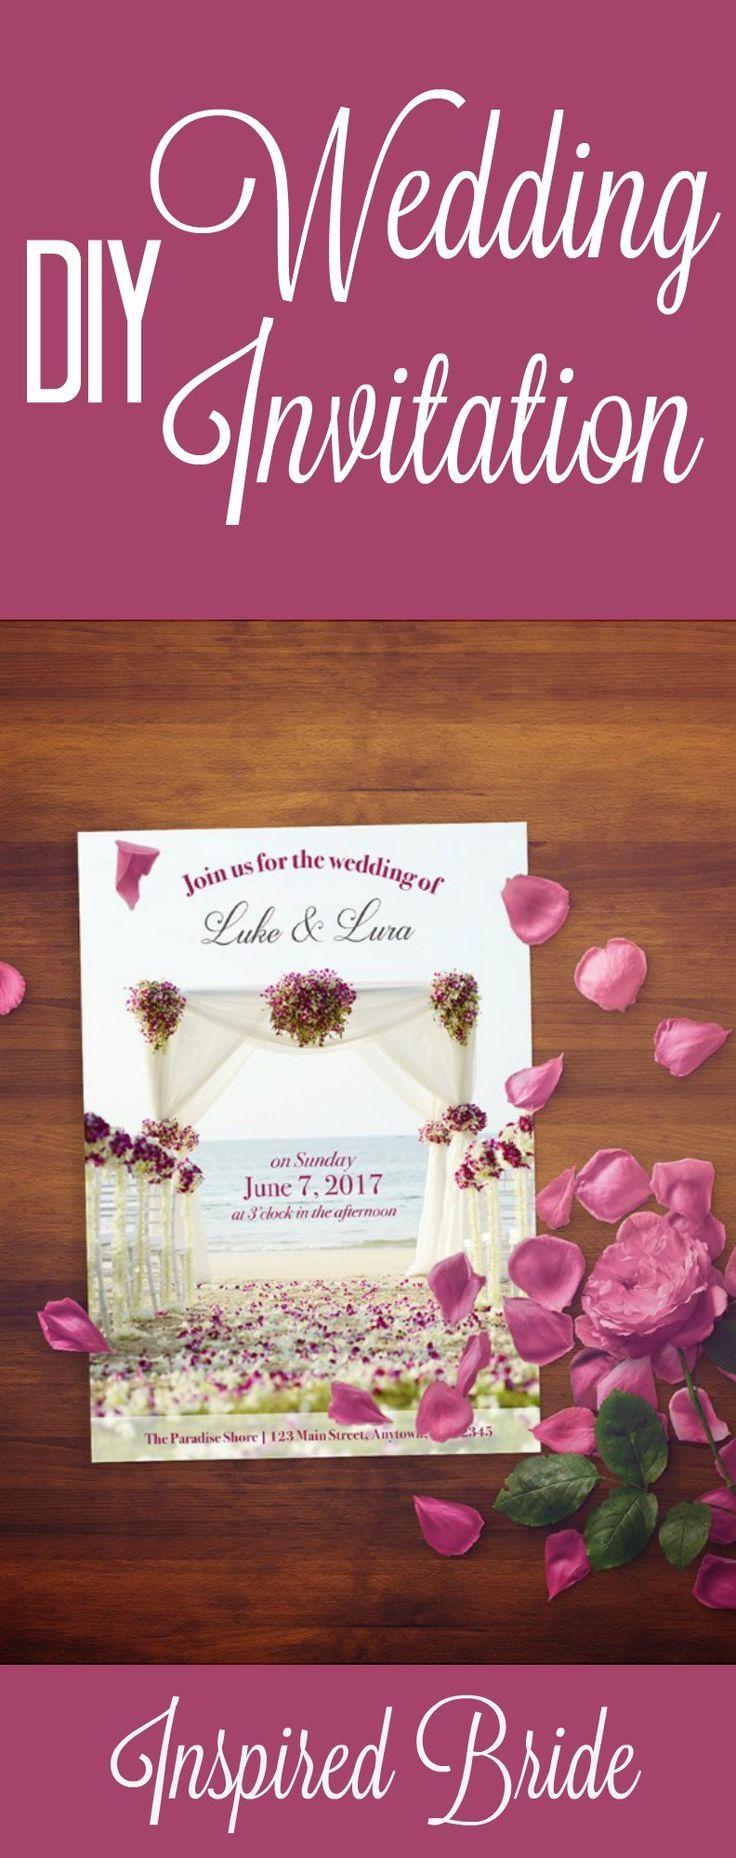 Best 25+ Budget wedding invitations ideas on Pinterest   Rustic ...